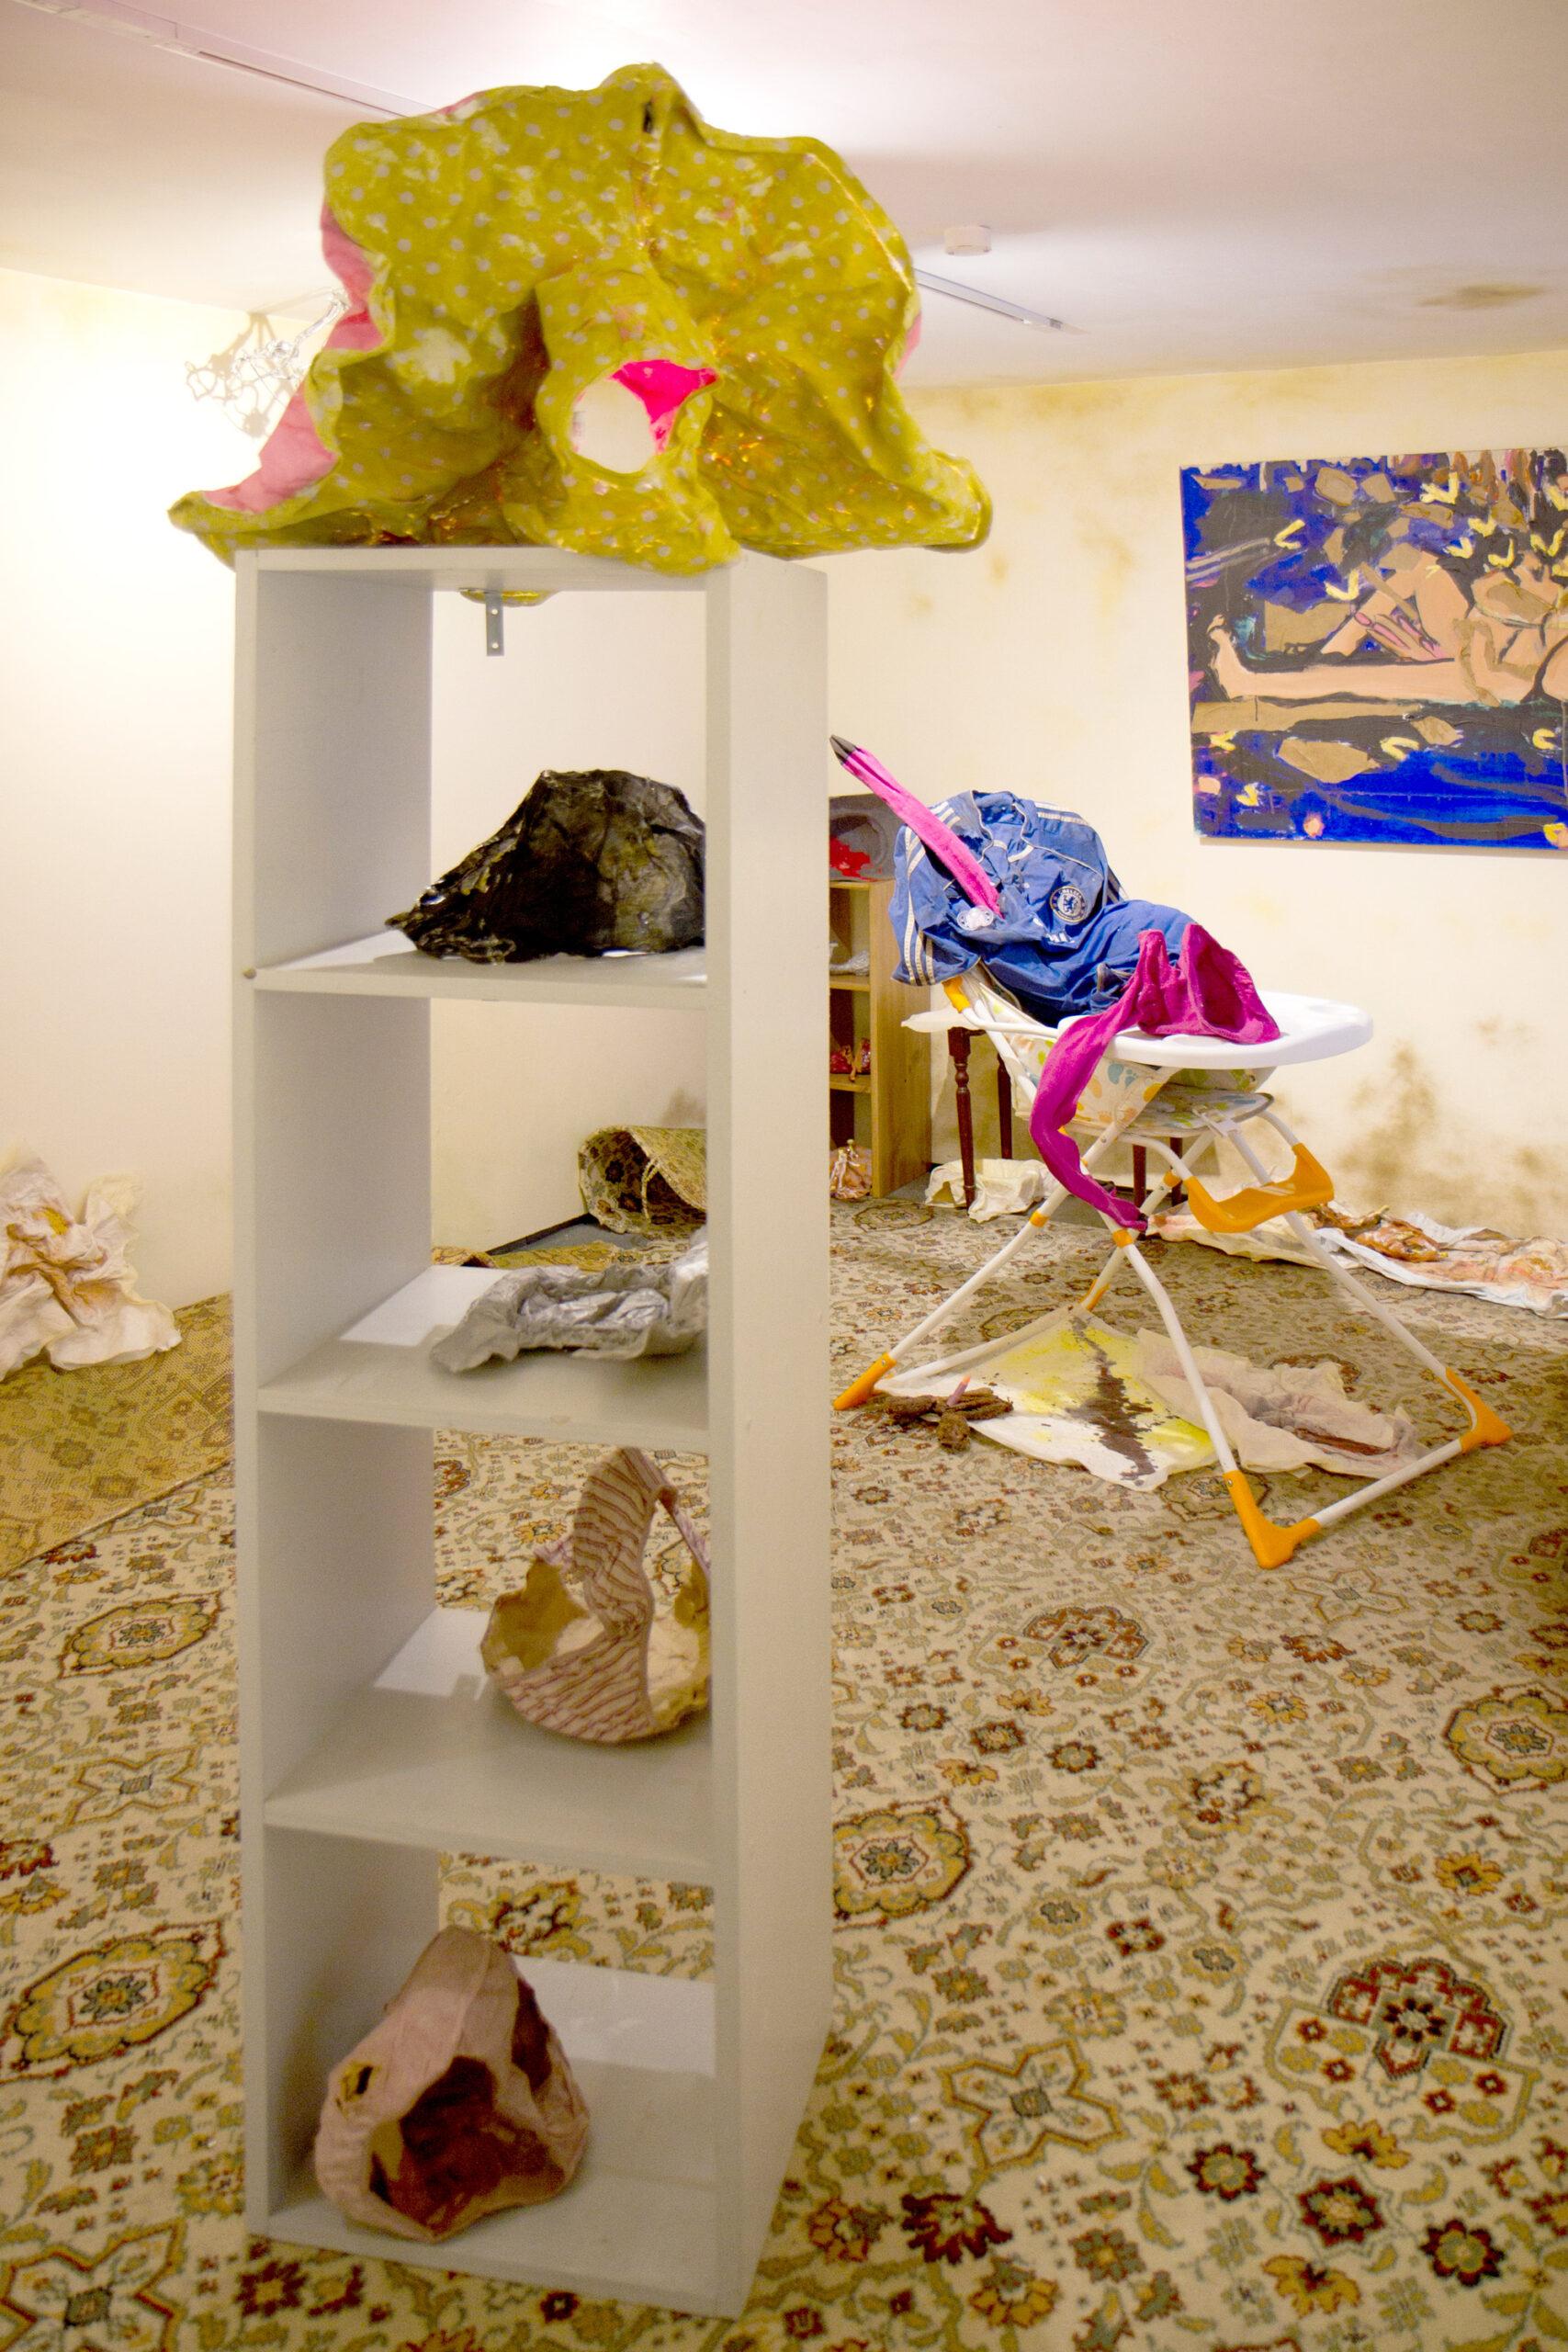 Lana Locke: Making (Babies) at Lungley gallery, London.